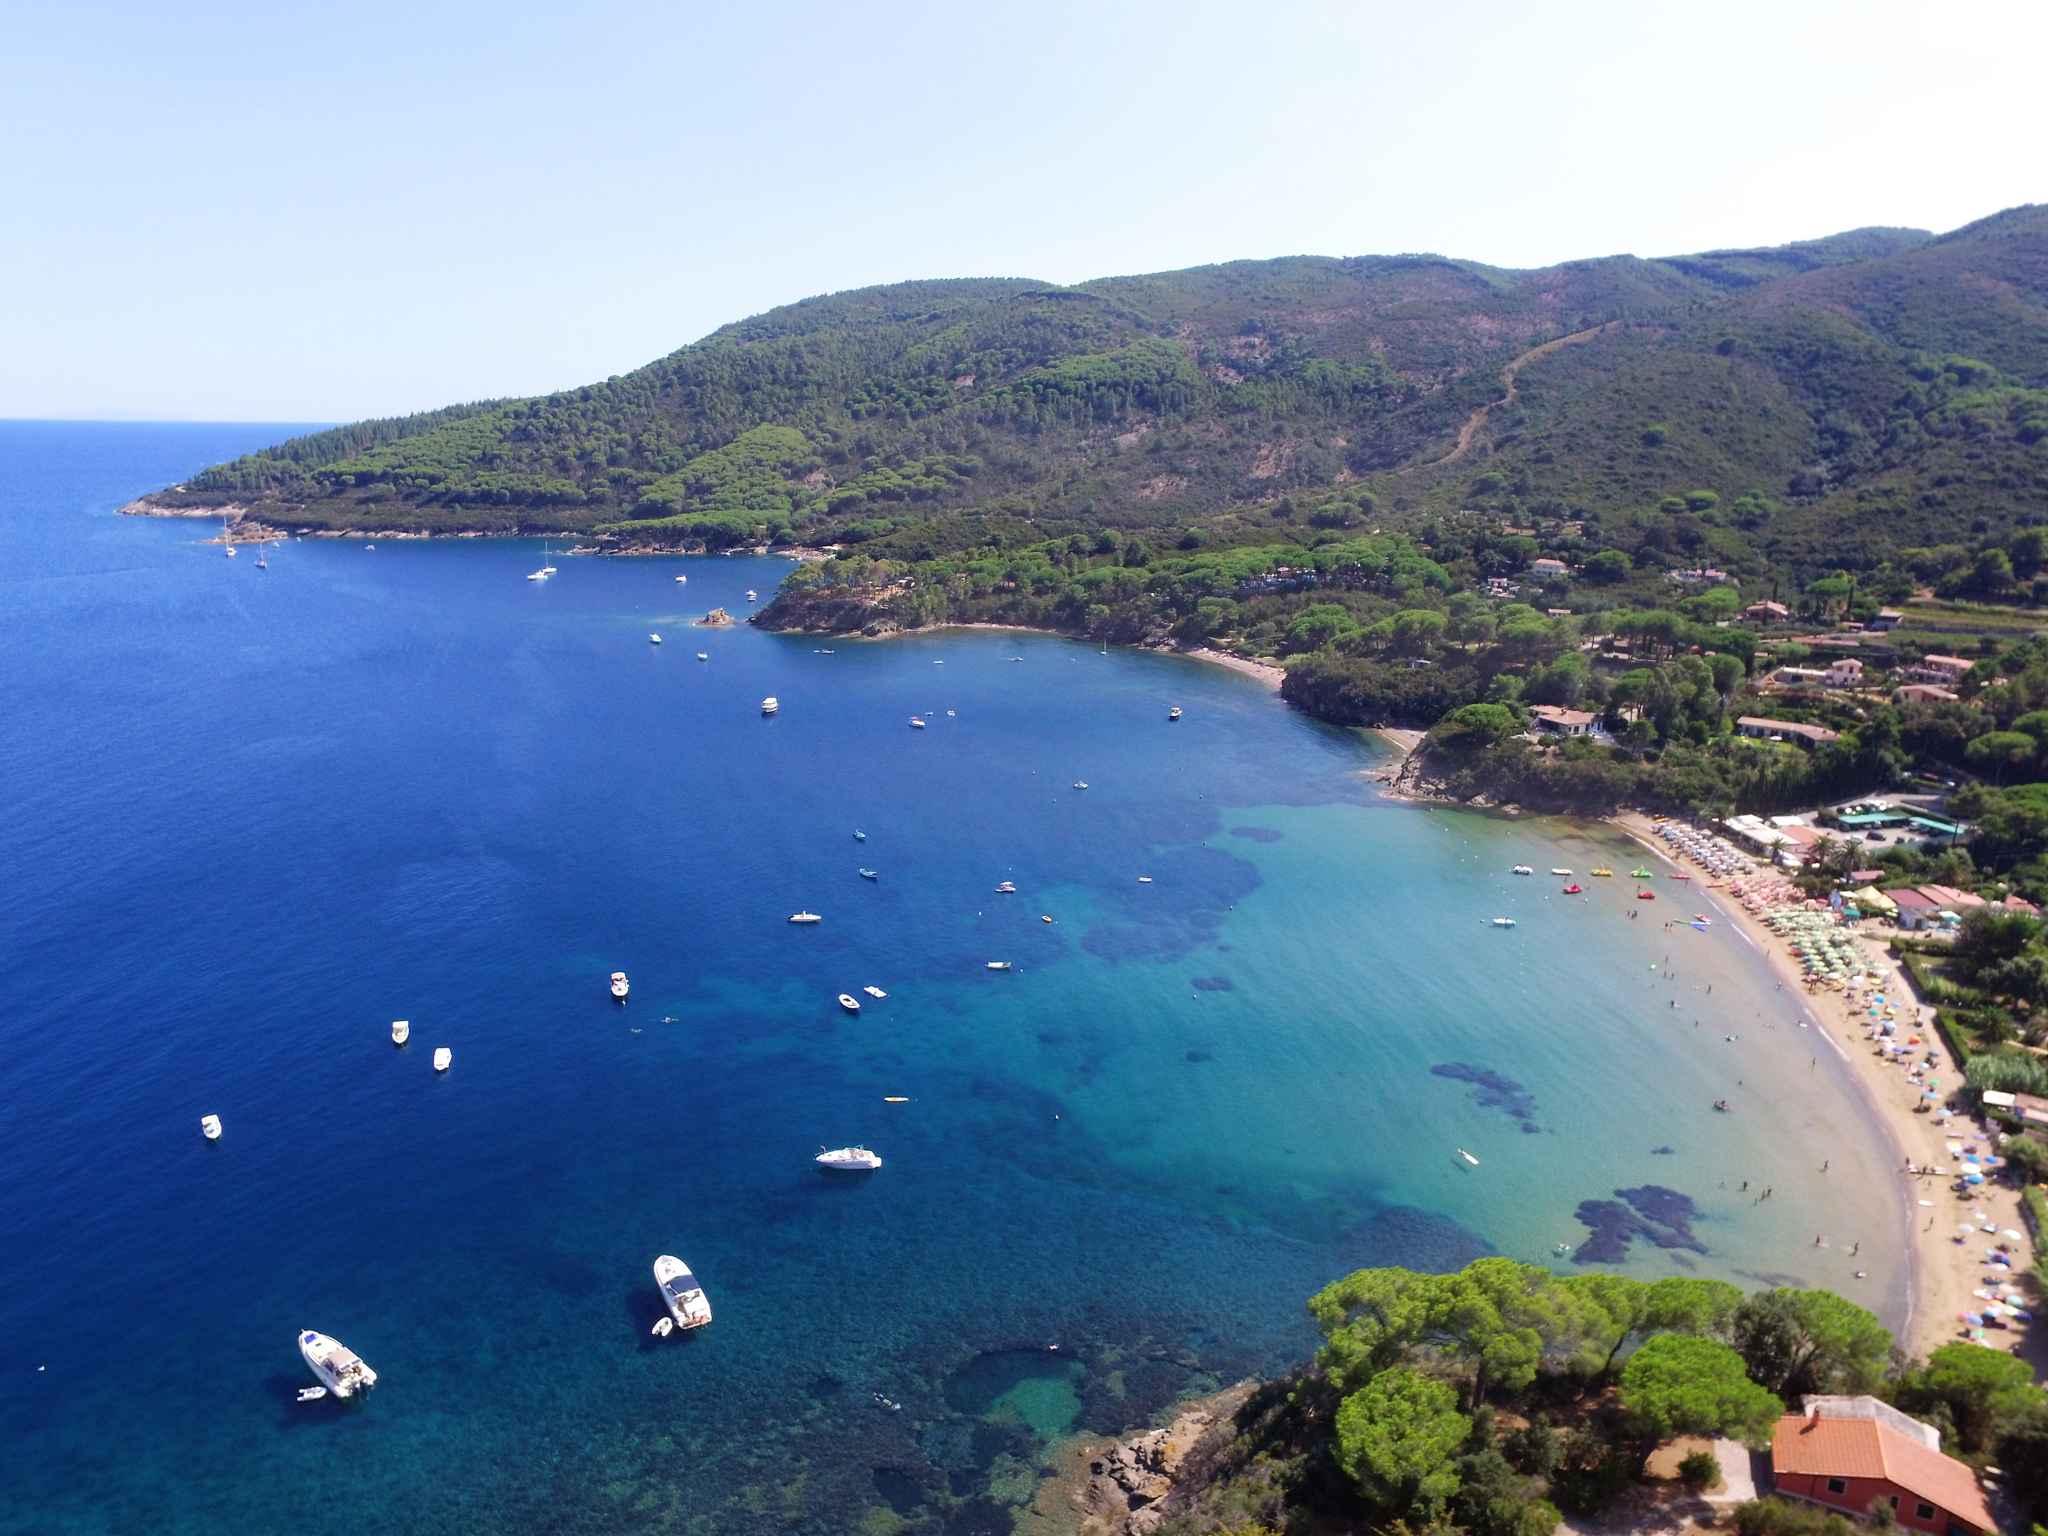 Ferienwohnung mit Panoramablick (404925), Capoliveri, Elba, Toskana, Italien, Bild 12